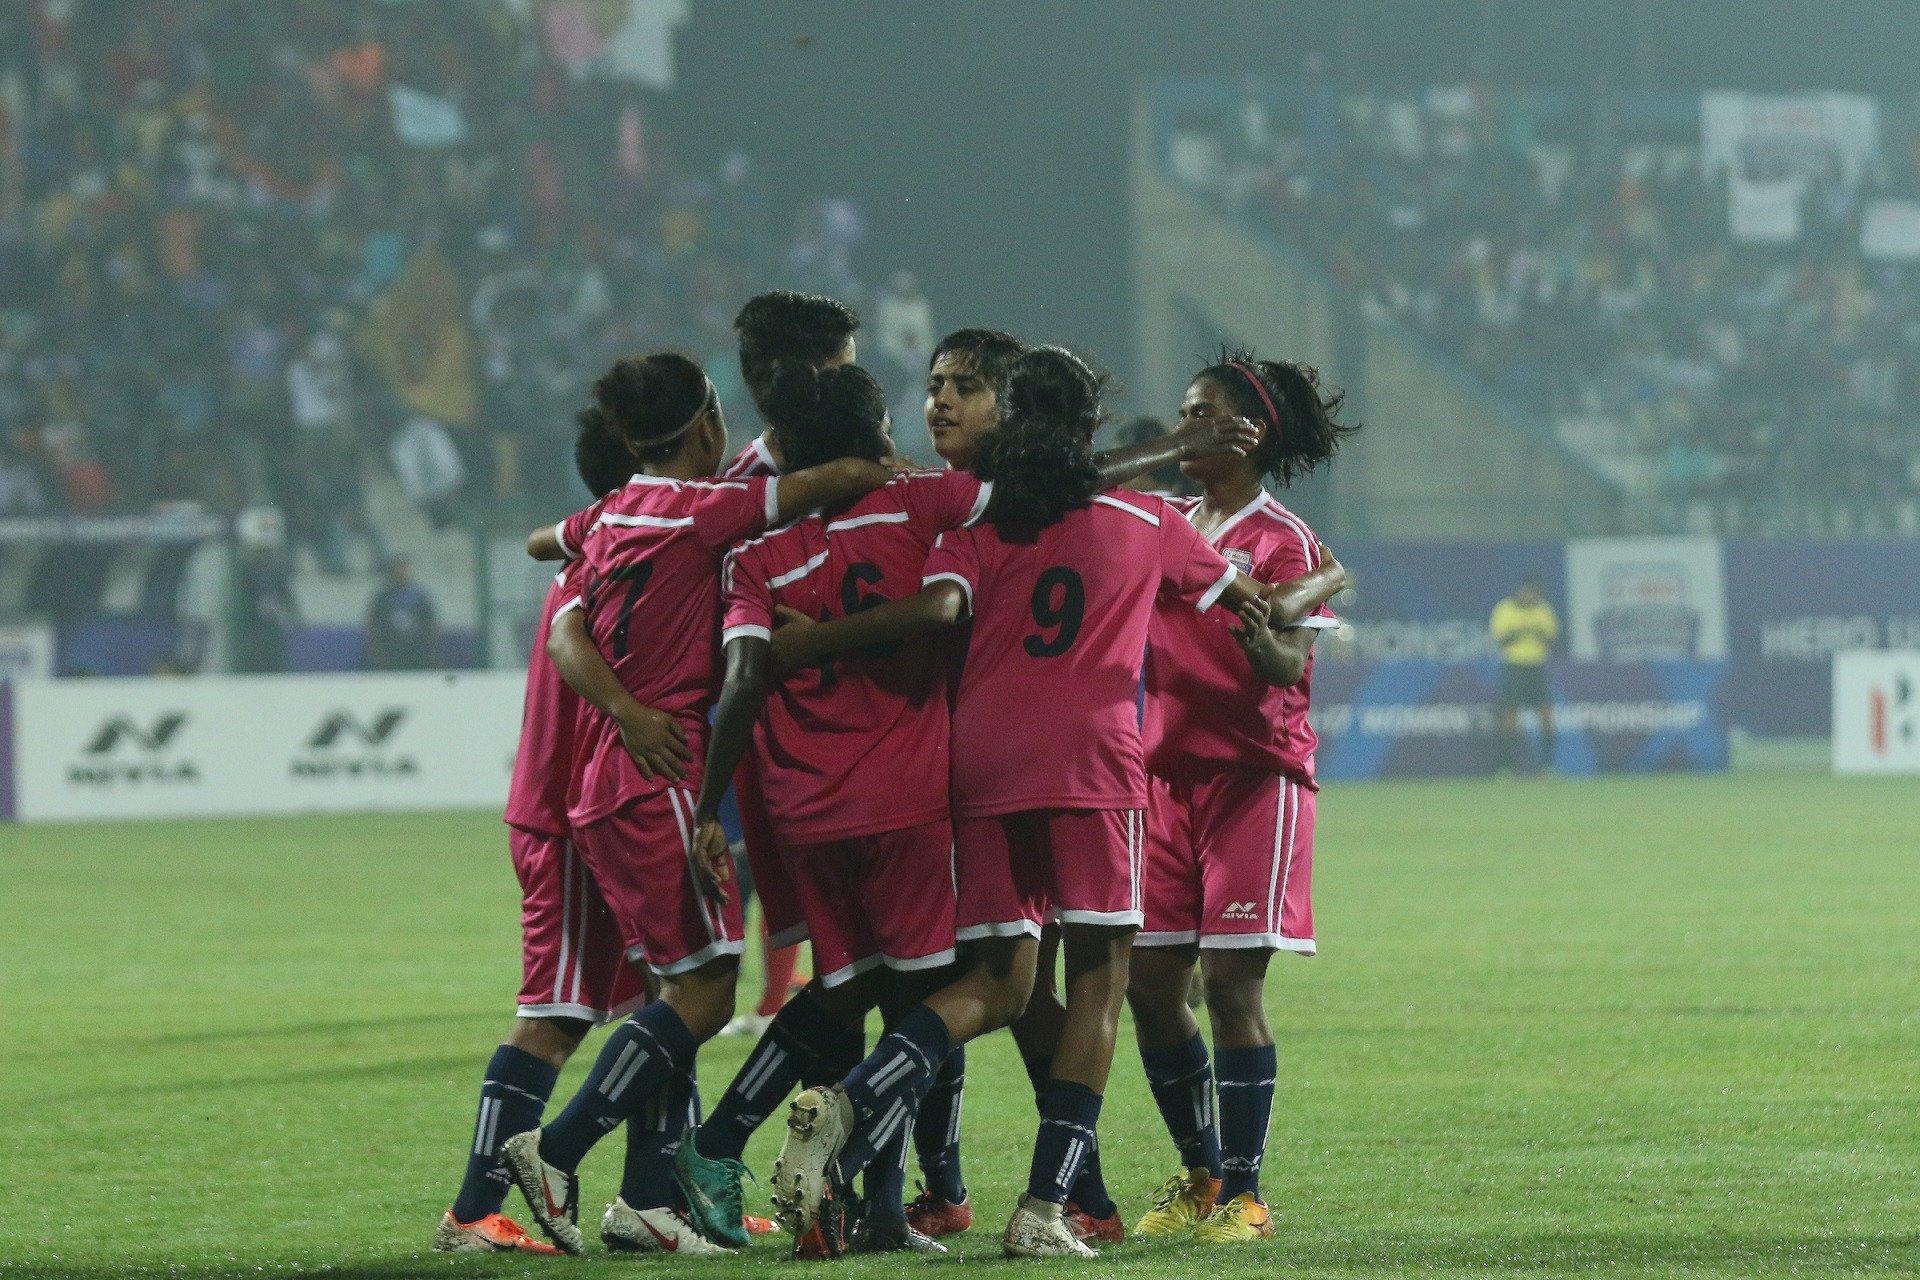 Hero U-17 Women's Championship Final: Lionesses roar victorious